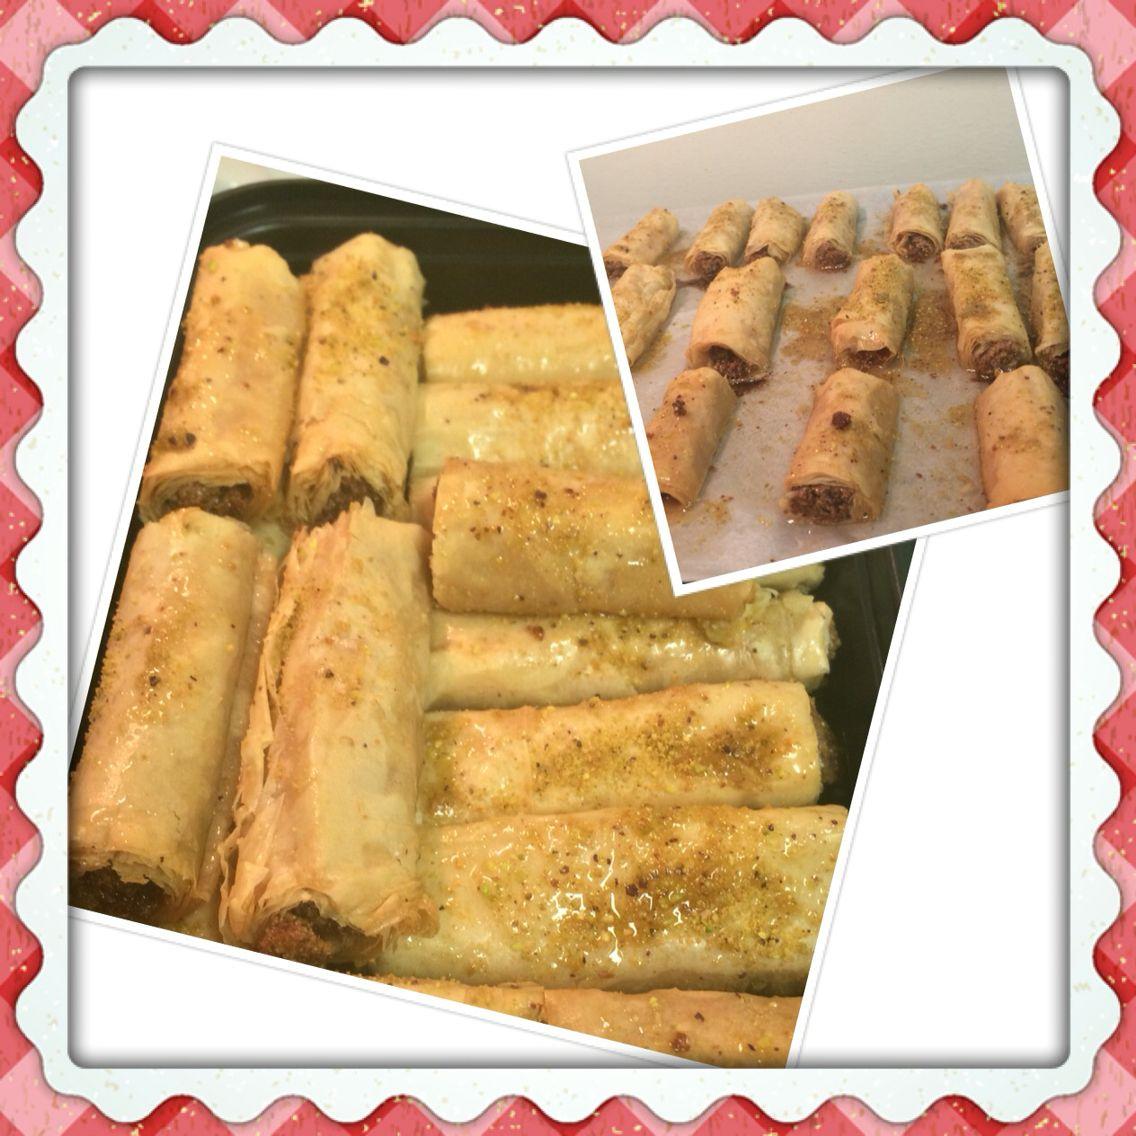 #mycooking #allhomemade #baklawa #lebanesecooking #lebanesecuisine #lebanesegastronomy #gastronomy #dessert #baking #homemade